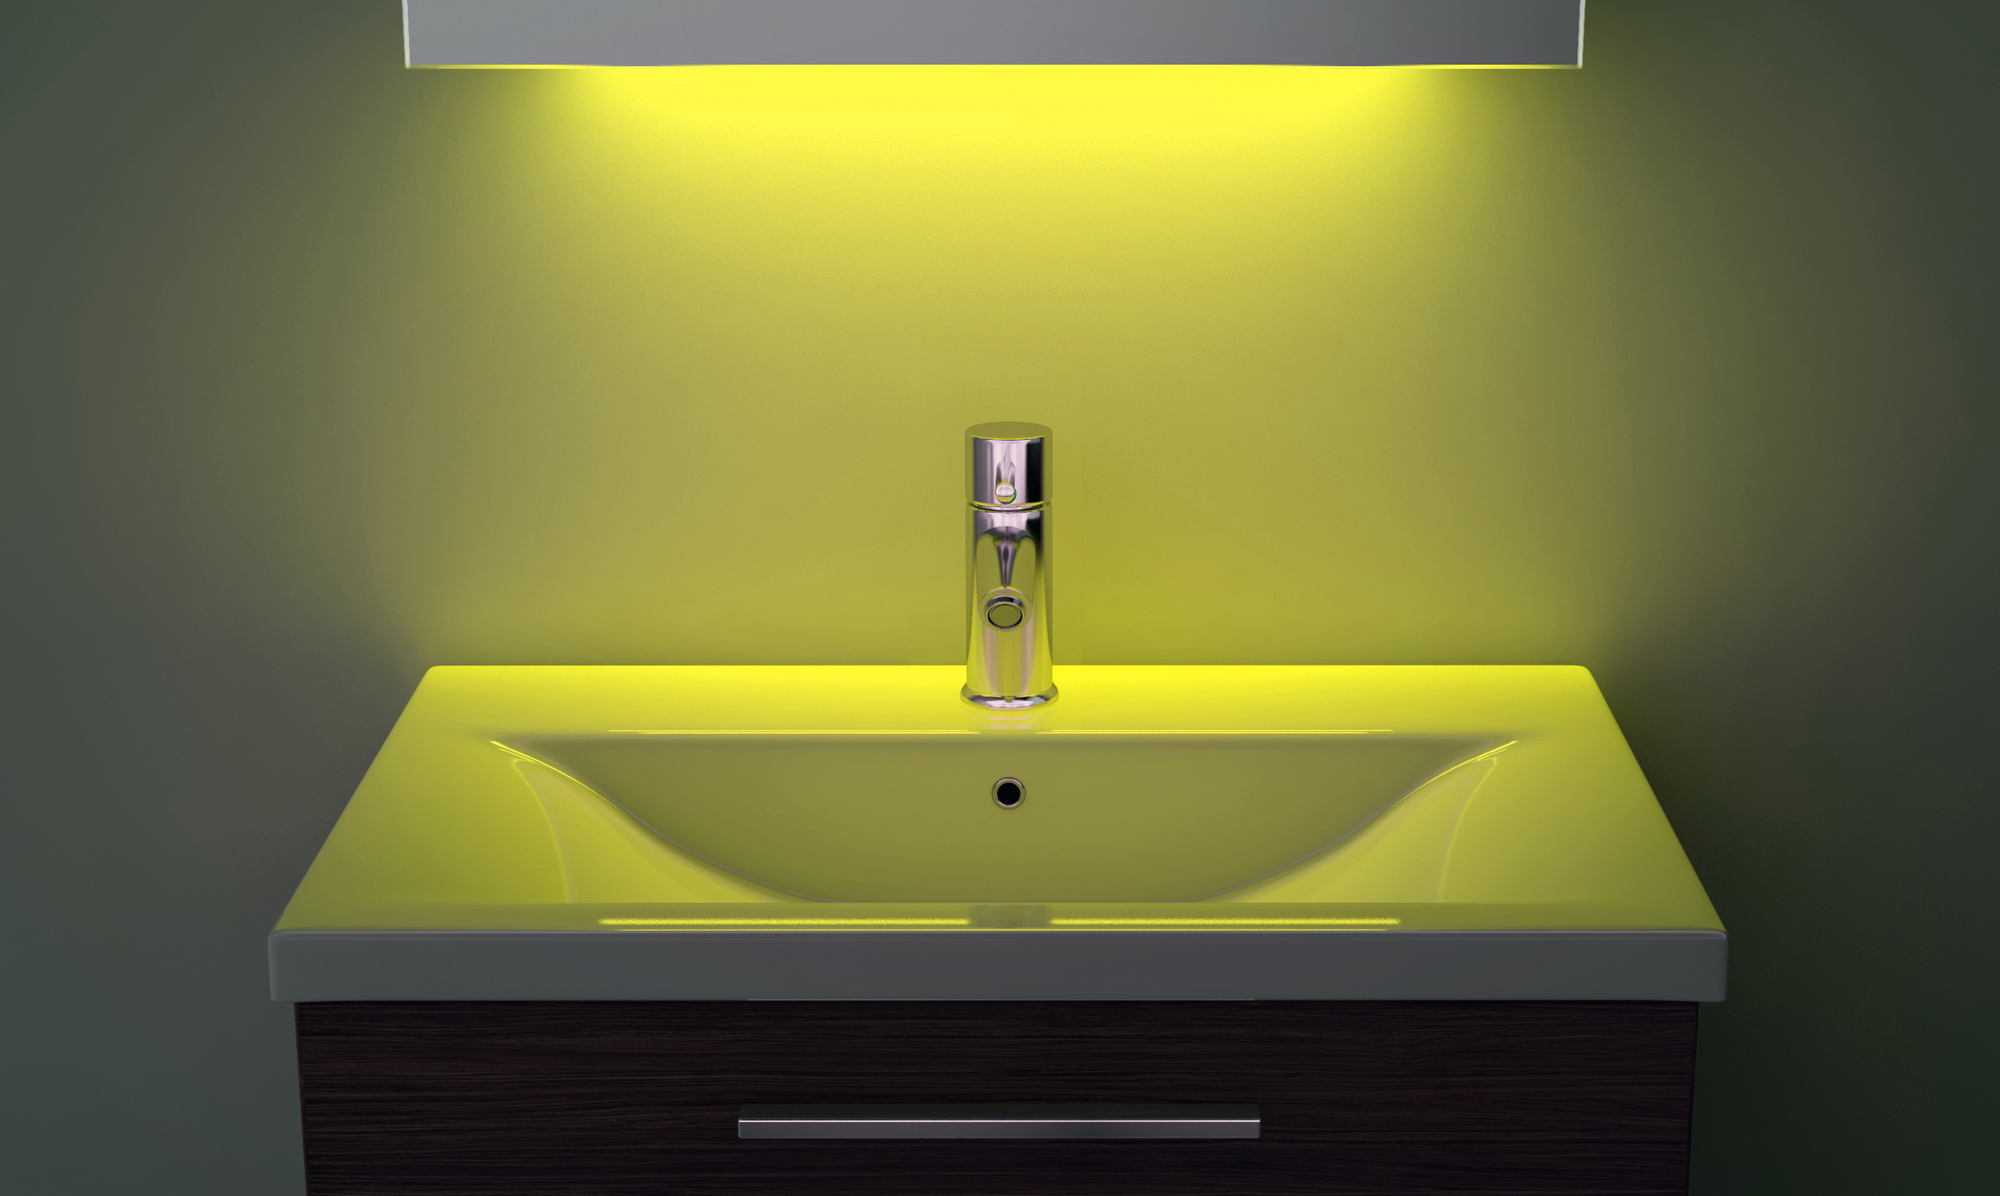 Ambient Shaver LED Bathroom Illuminated Mirror With Demister Pad ...